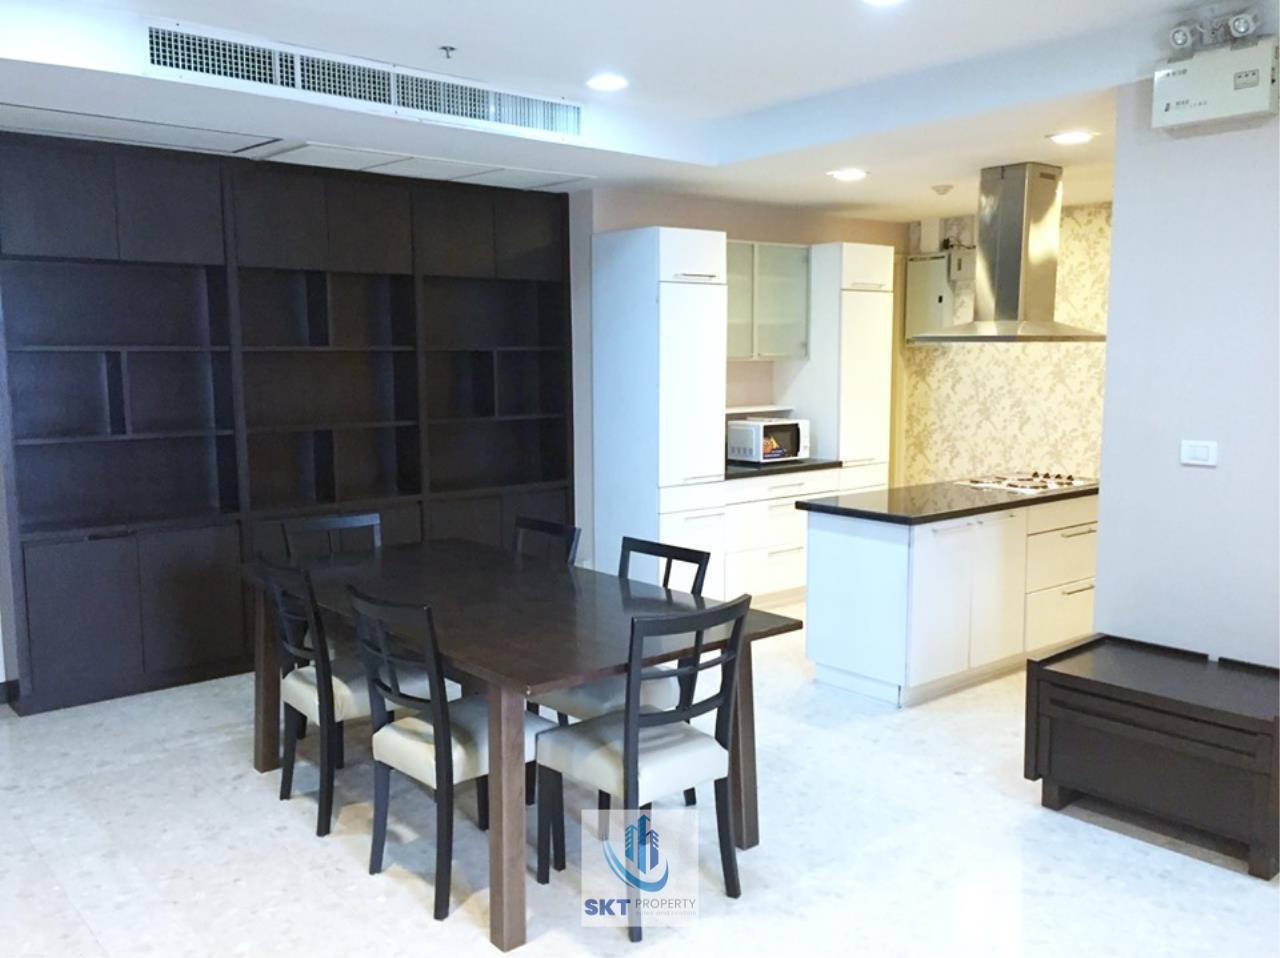 Sukritta Property Agency's Nusasiri grand condo neat BTS Ekamai 3